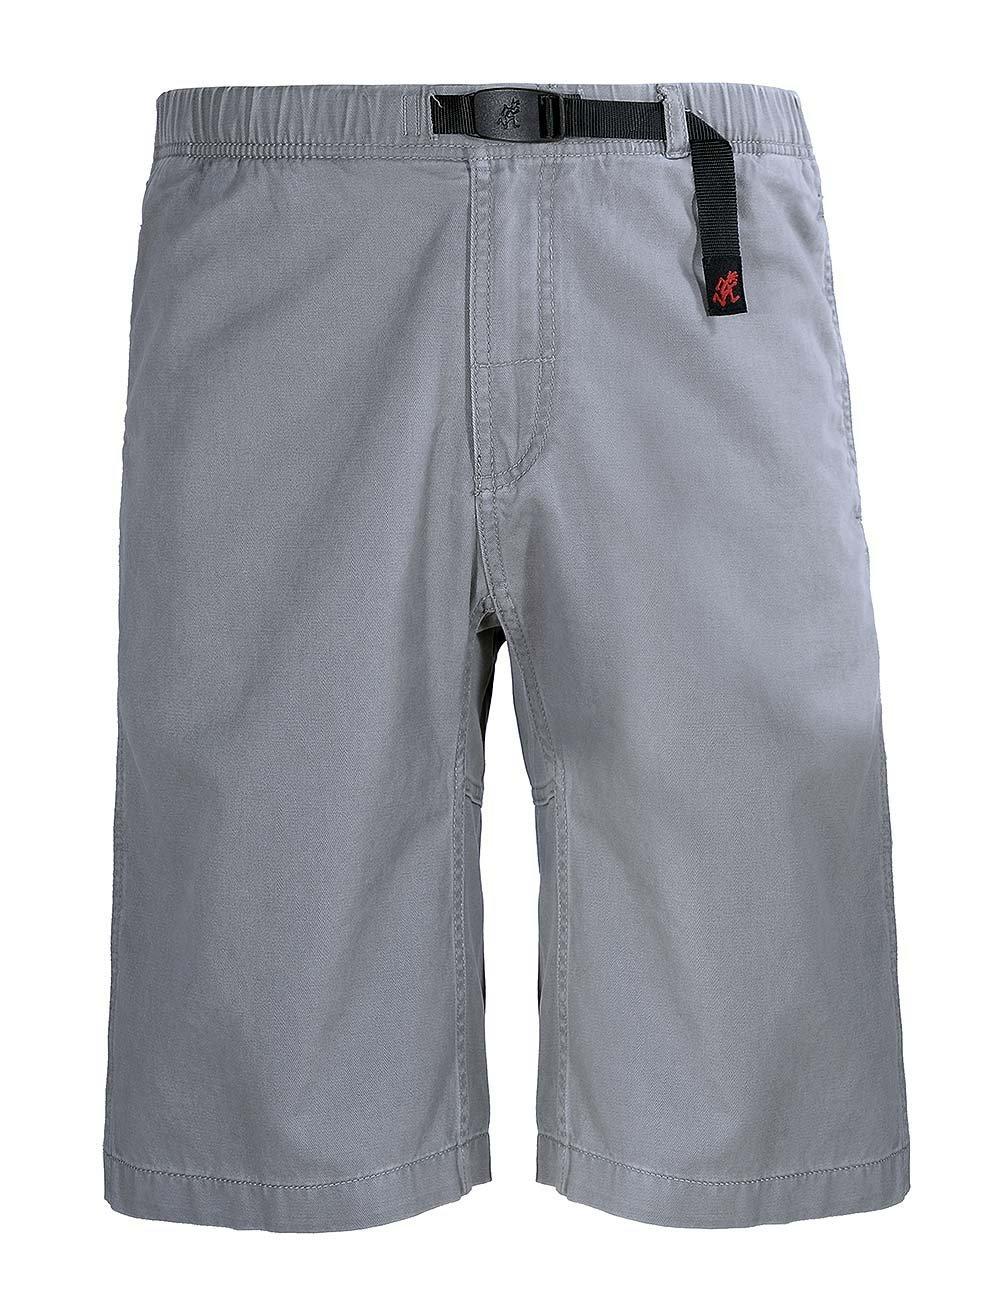 Gramicci Rockin Sport Short - Men's-Stainless